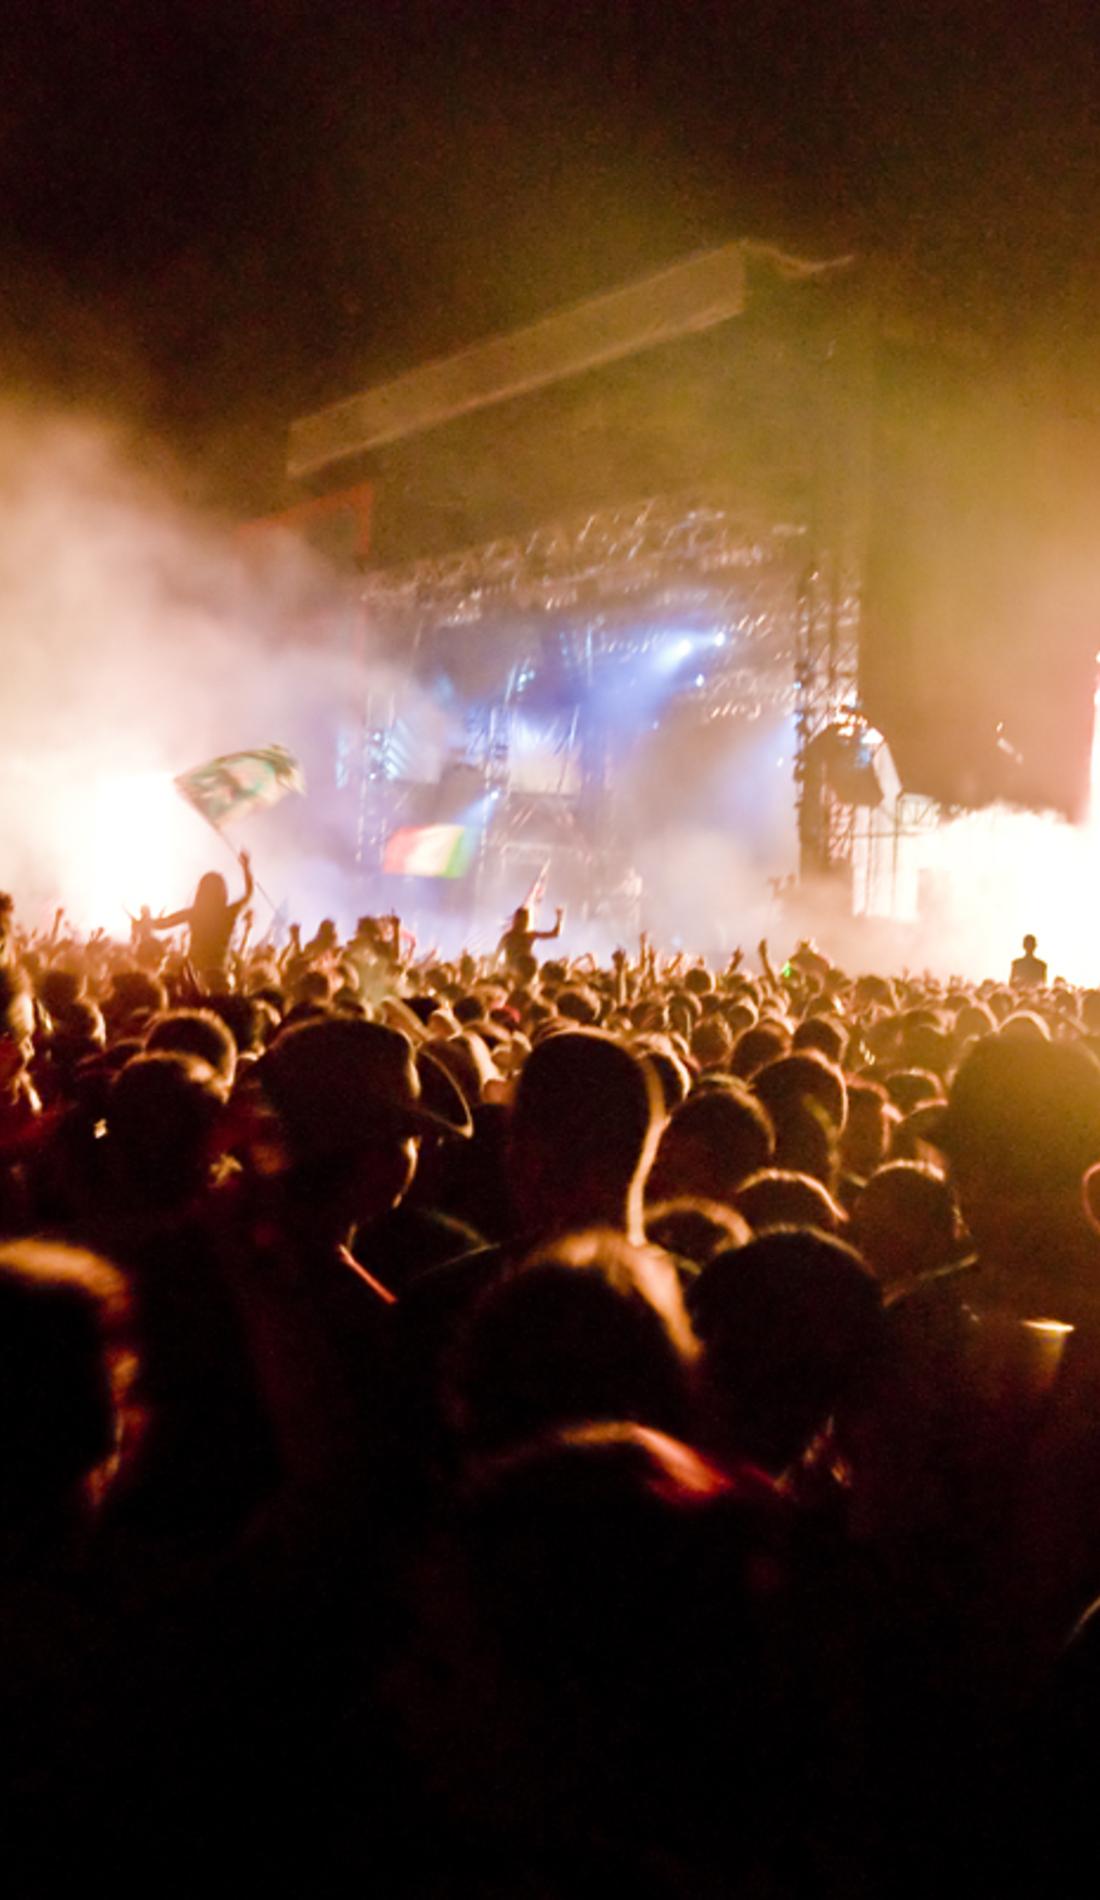 A Dreamville Festival live event